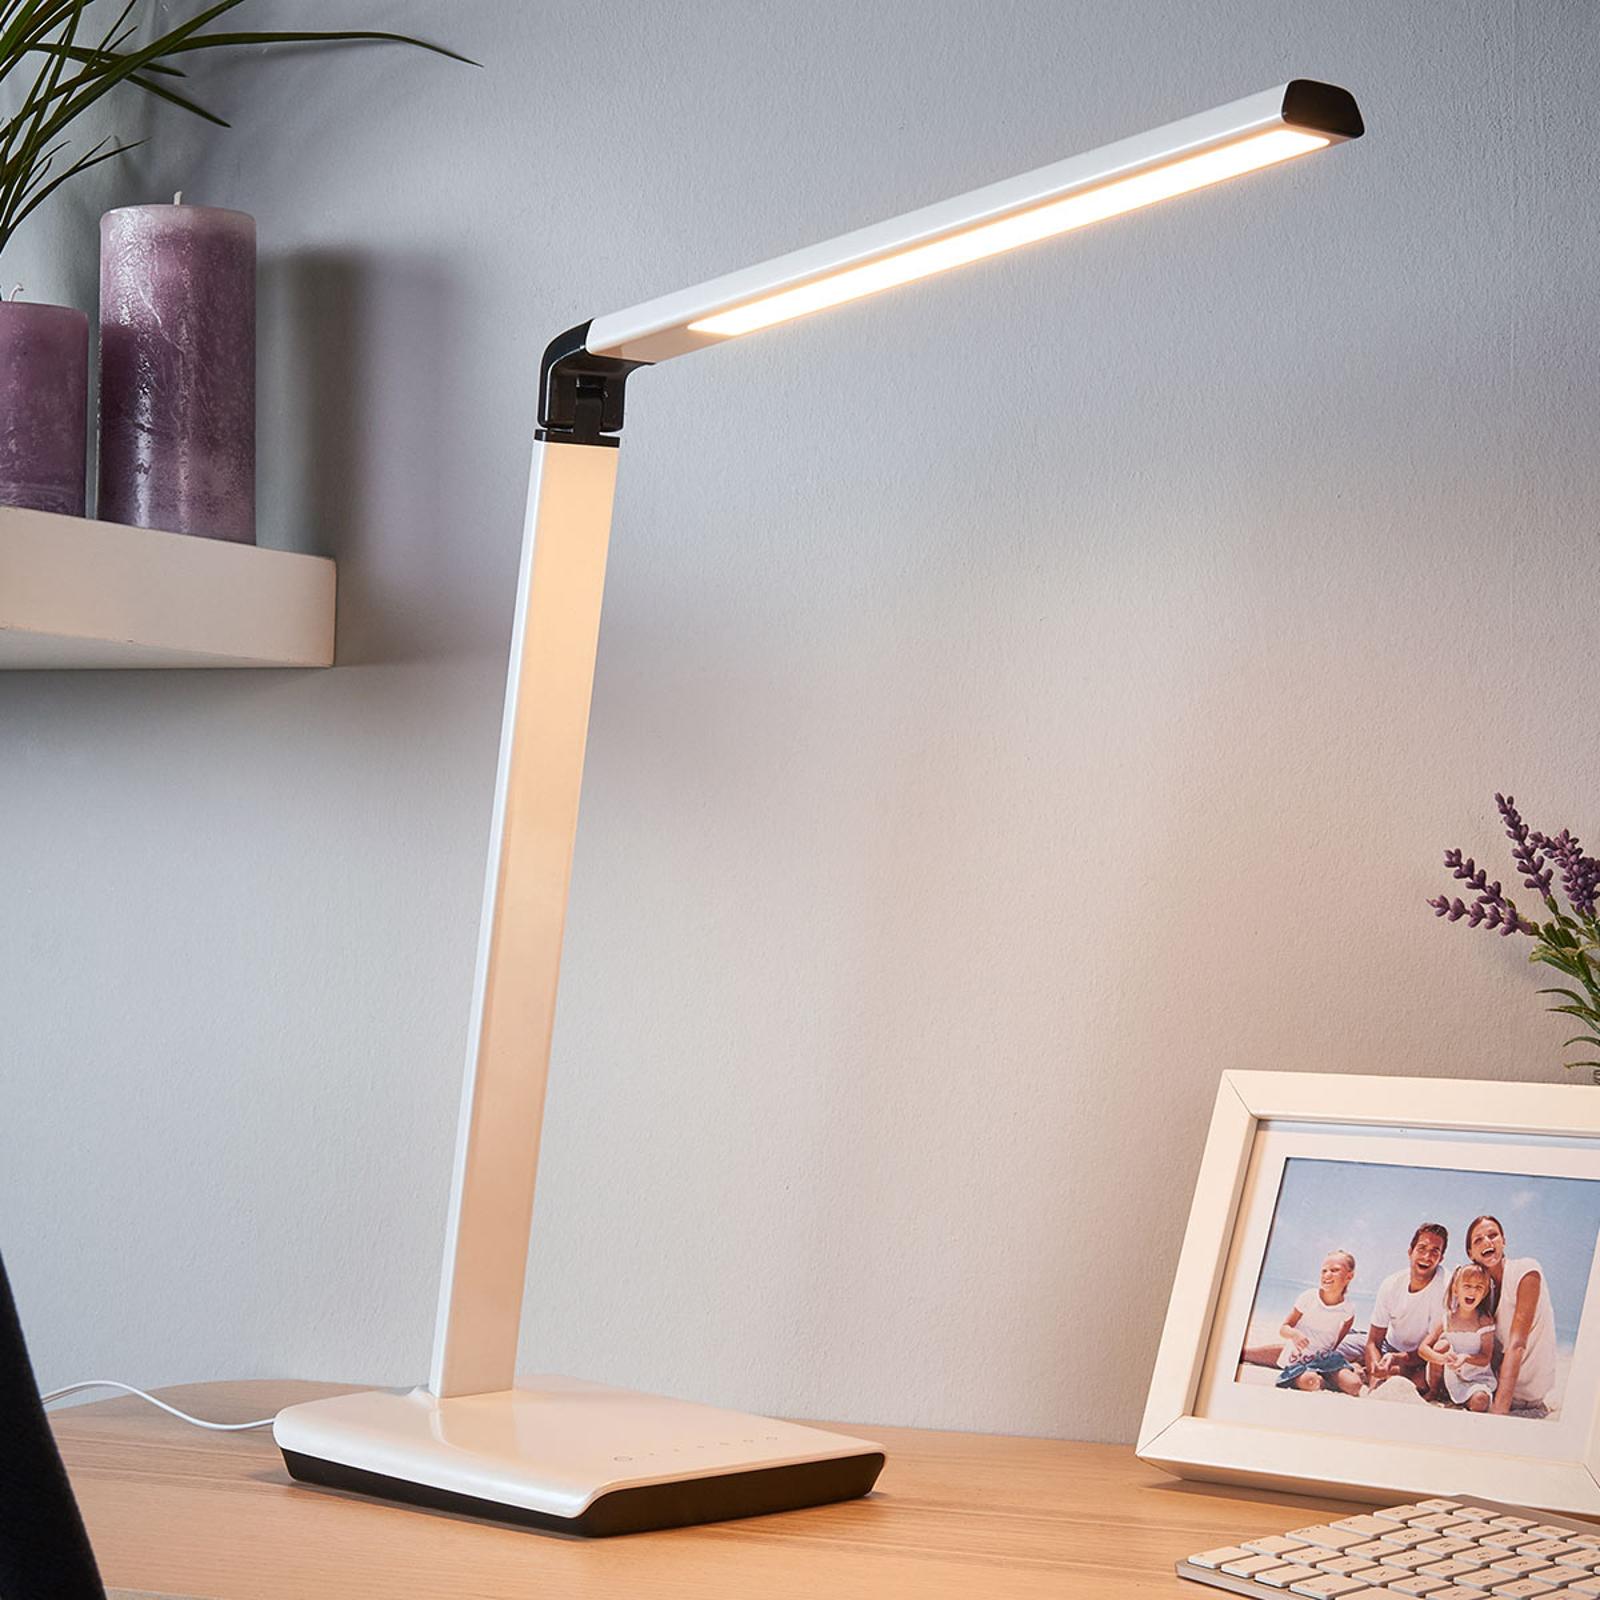 Lampe de bureau Kuno, port USB, variable LED